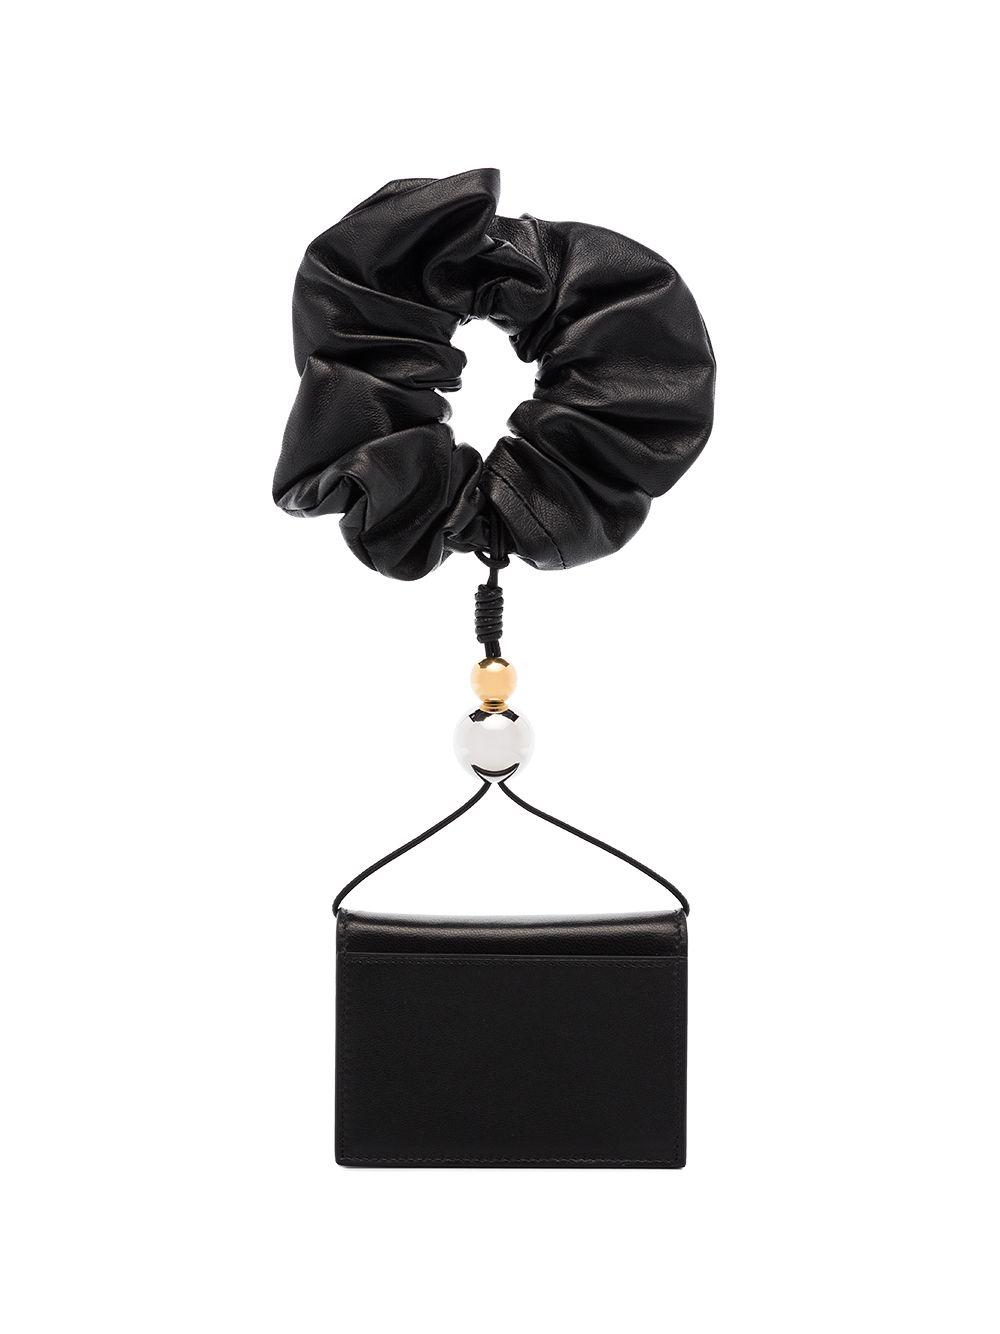 JIL SANDER JIL SANDER | Hand bags | JSPR840134001